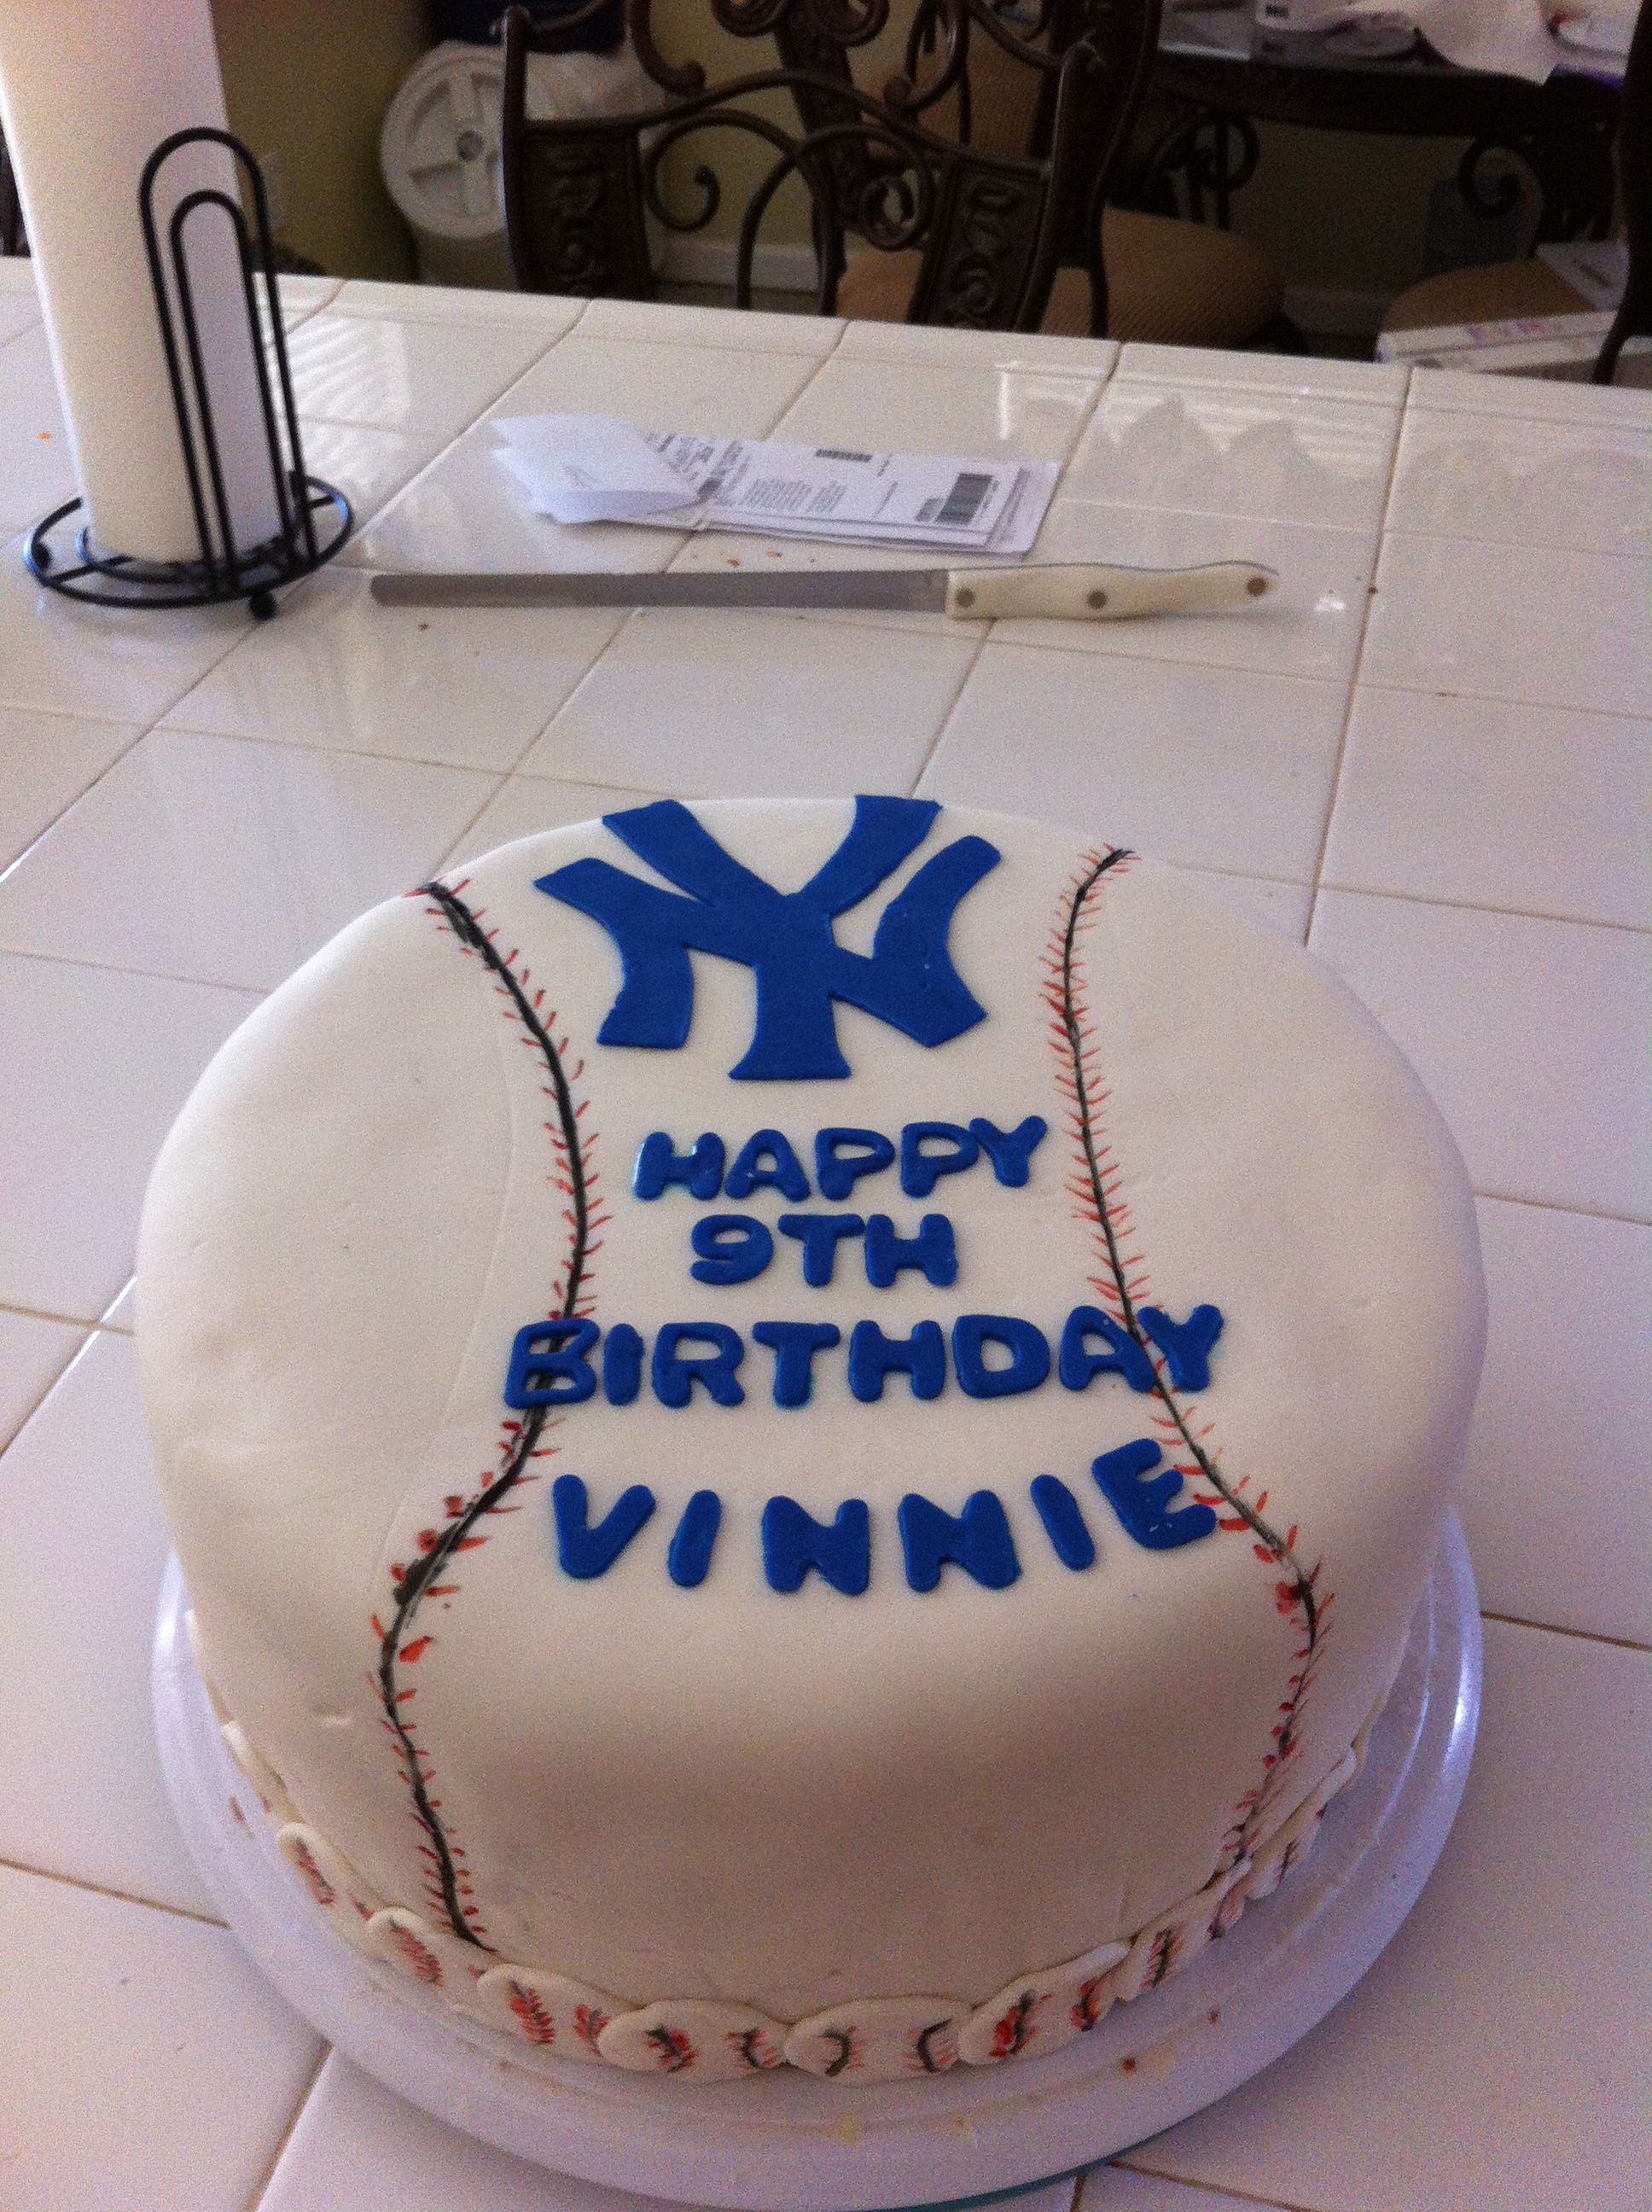 New York Yankees Cake Happy Birthday Vinnie